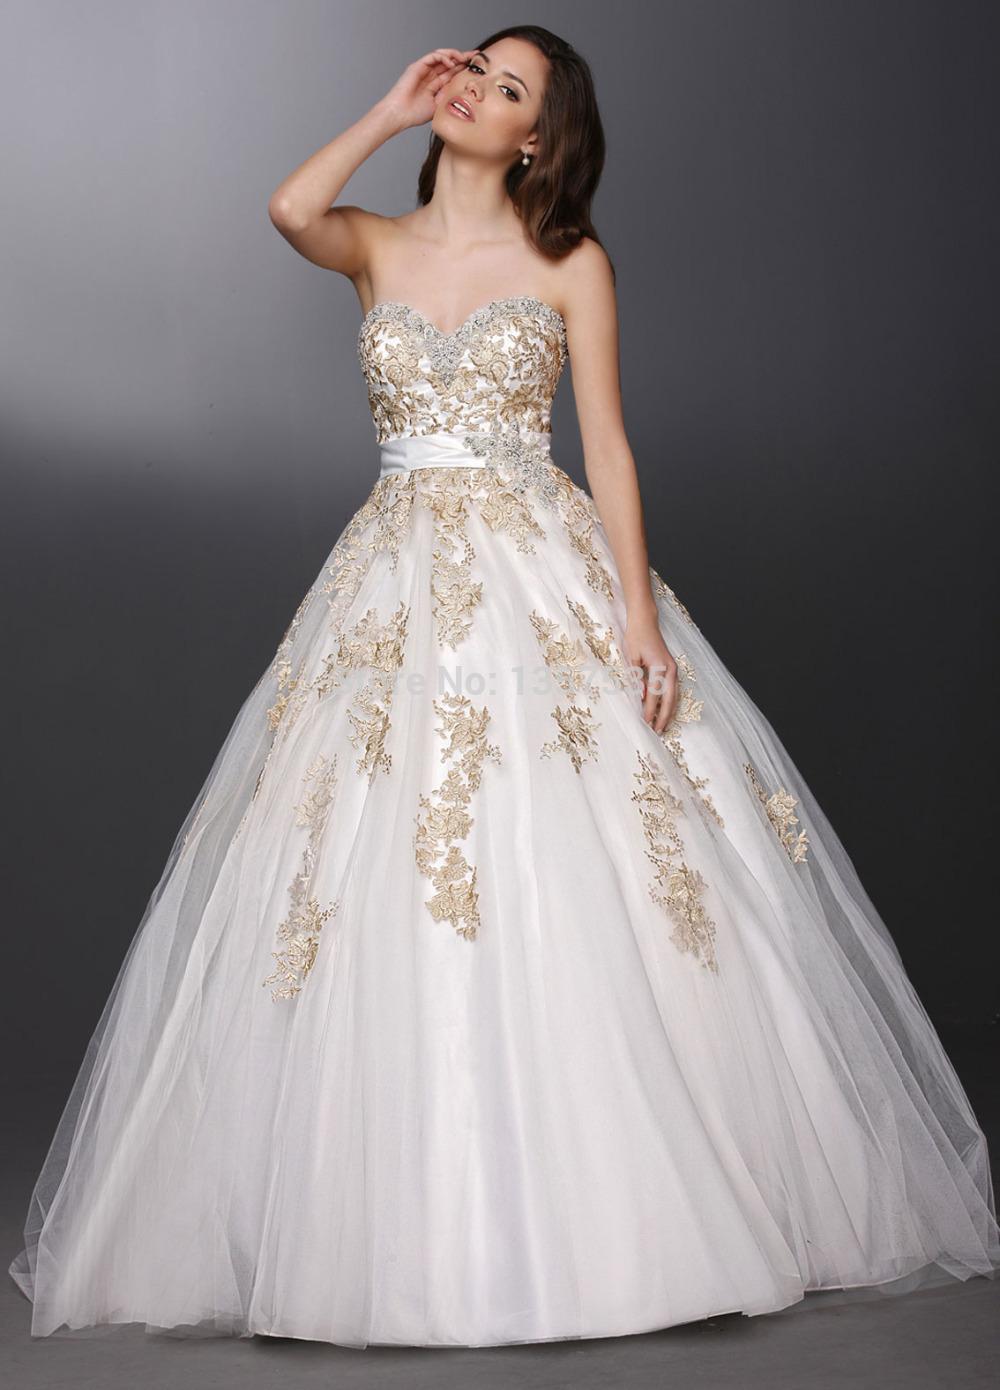 mermaid wedding dresses under 100 dollars - wedding dress shops